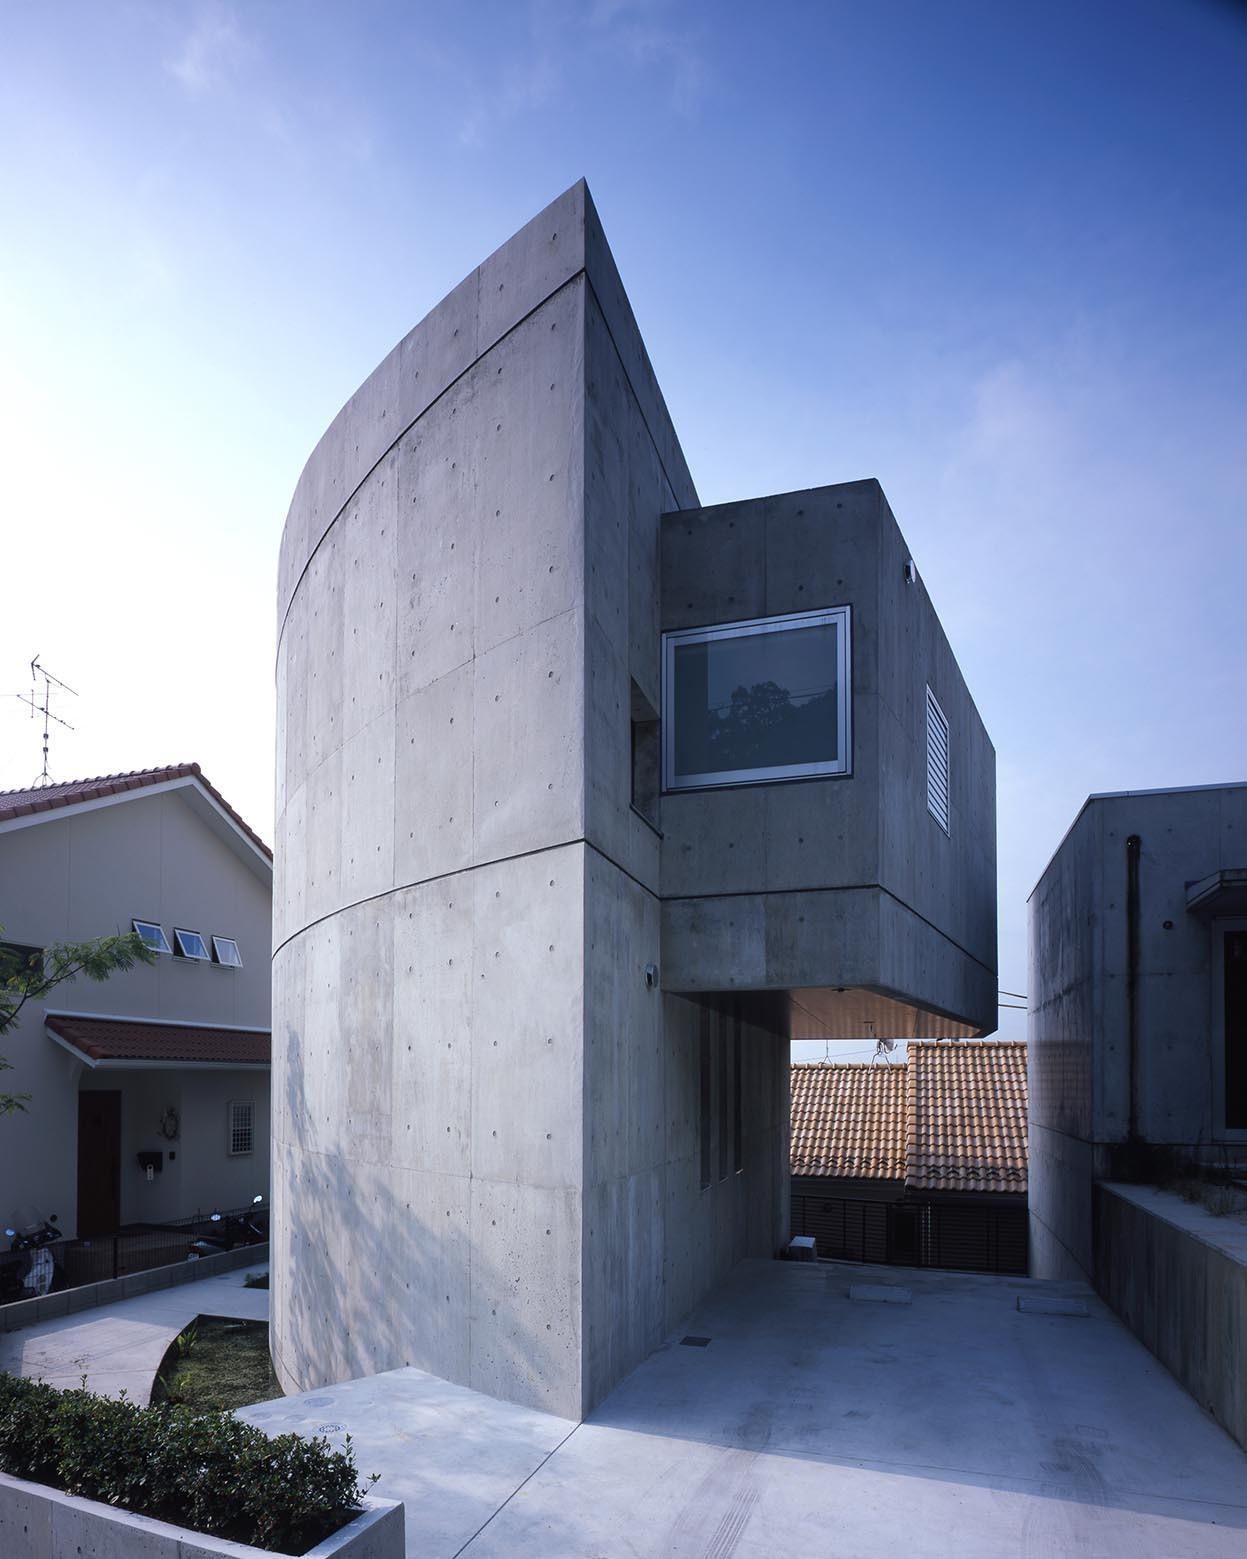 Gallery of Pure House / Kugatsuno Kaze Design Office  - 1